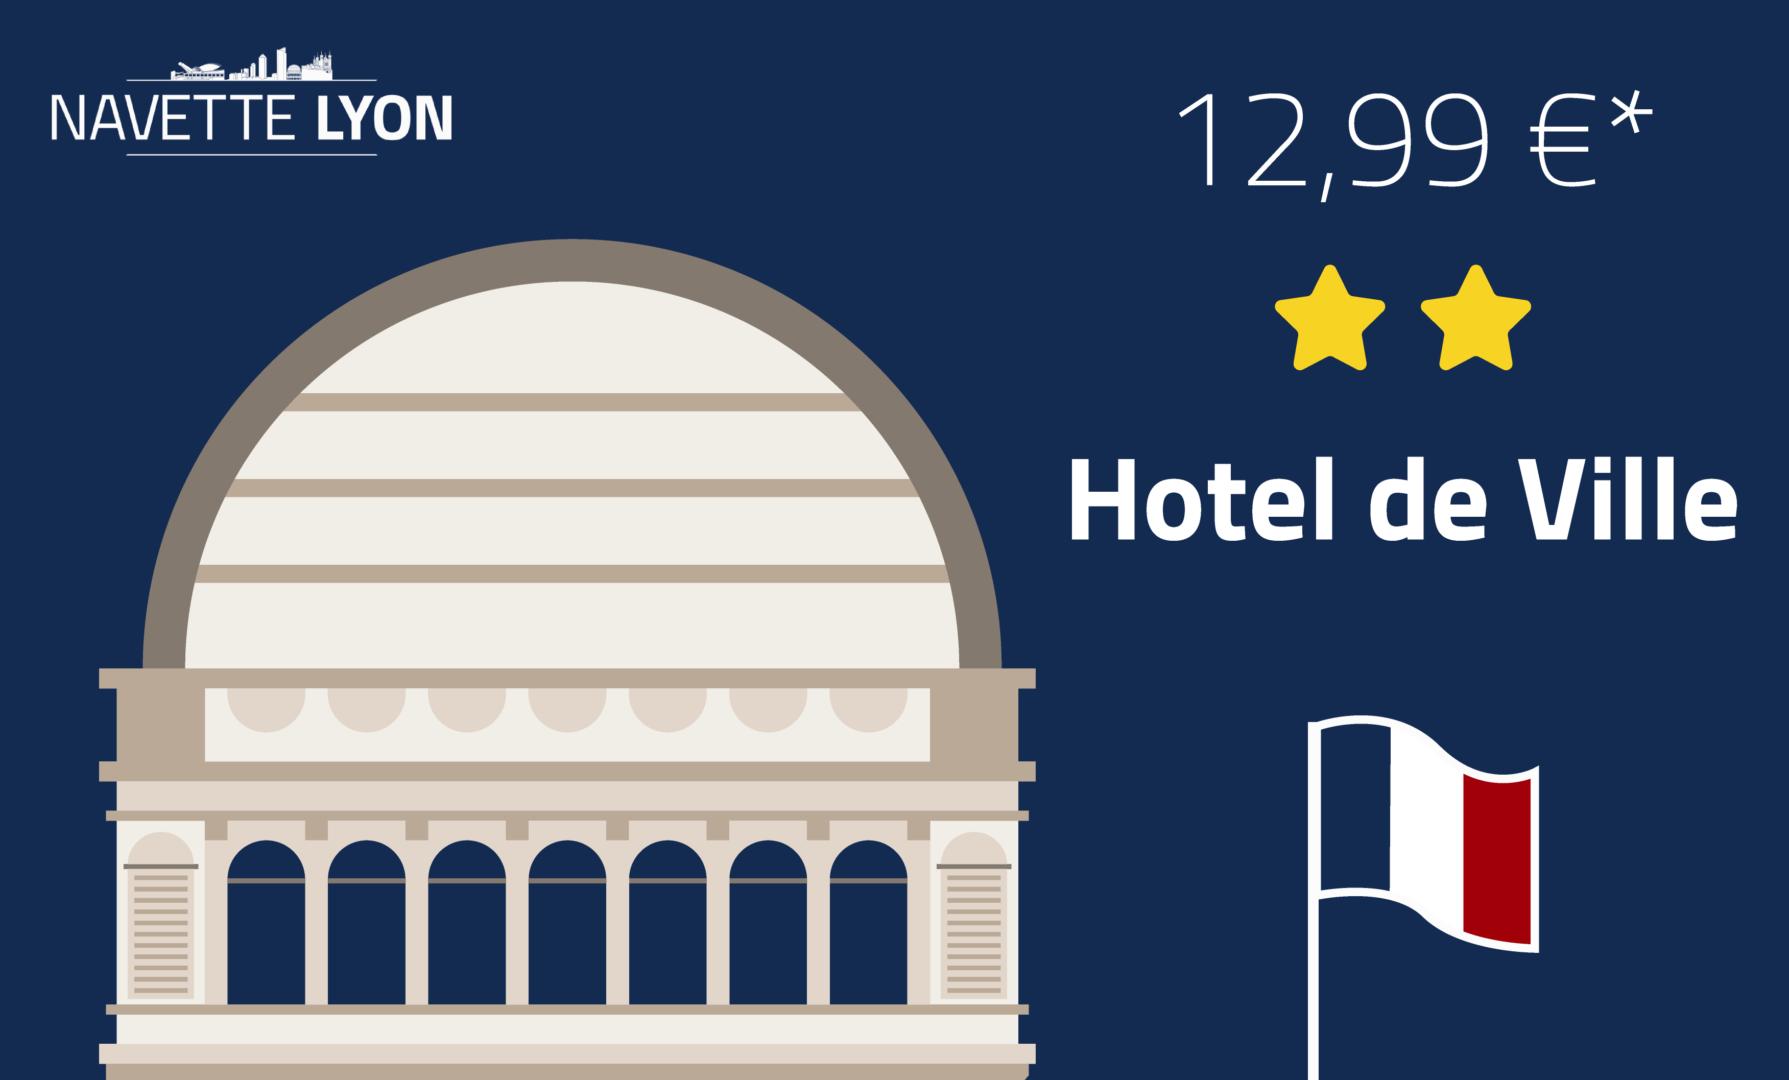 Hotel de ville Navette